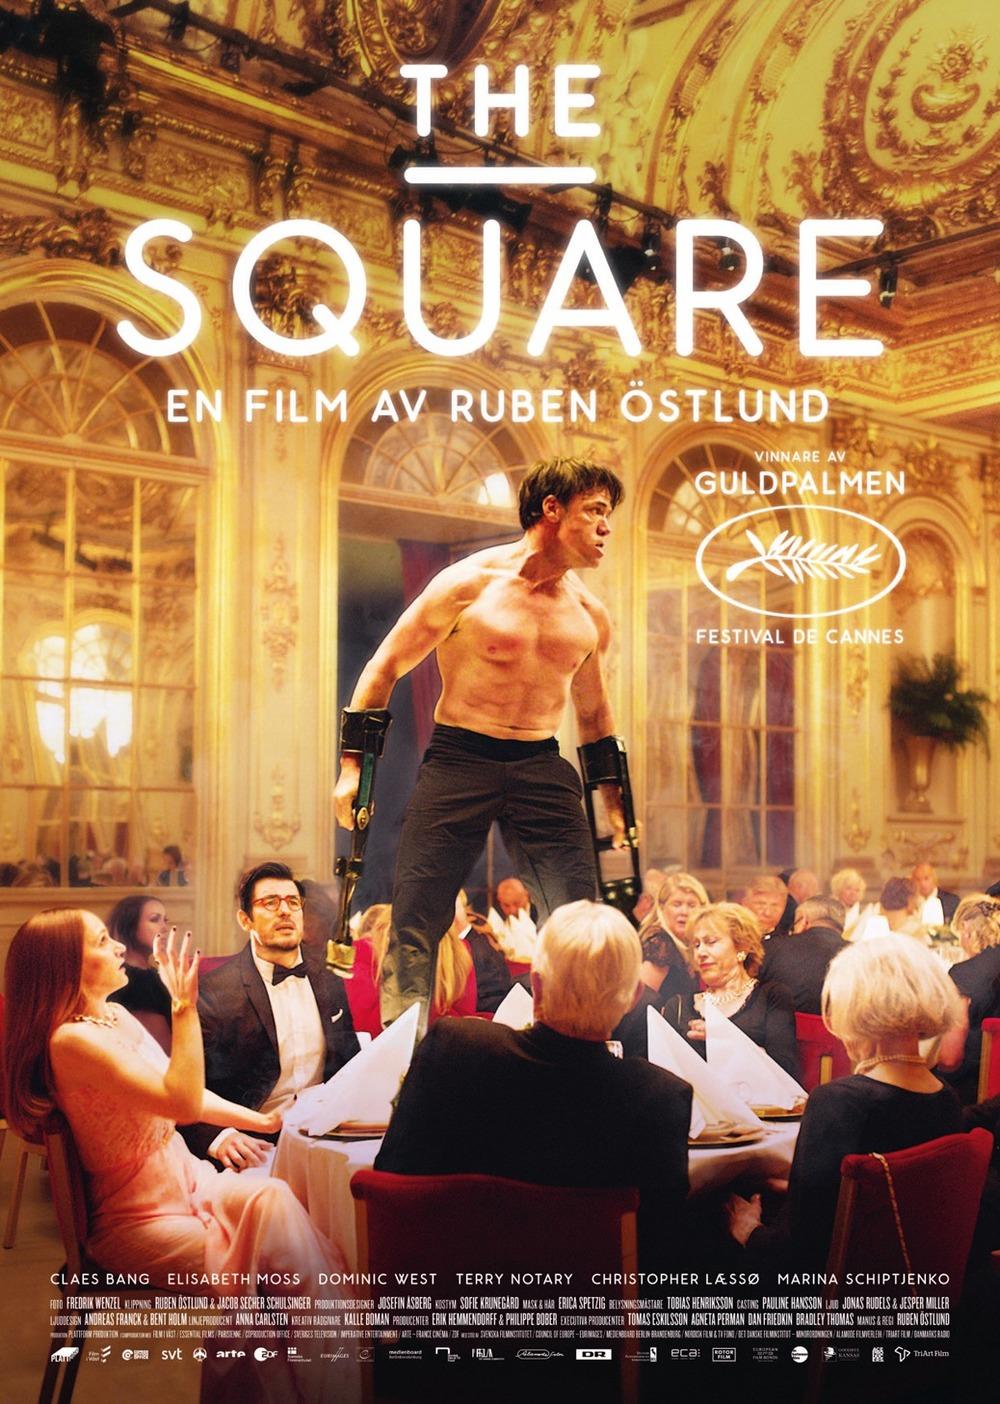 The Square Movie